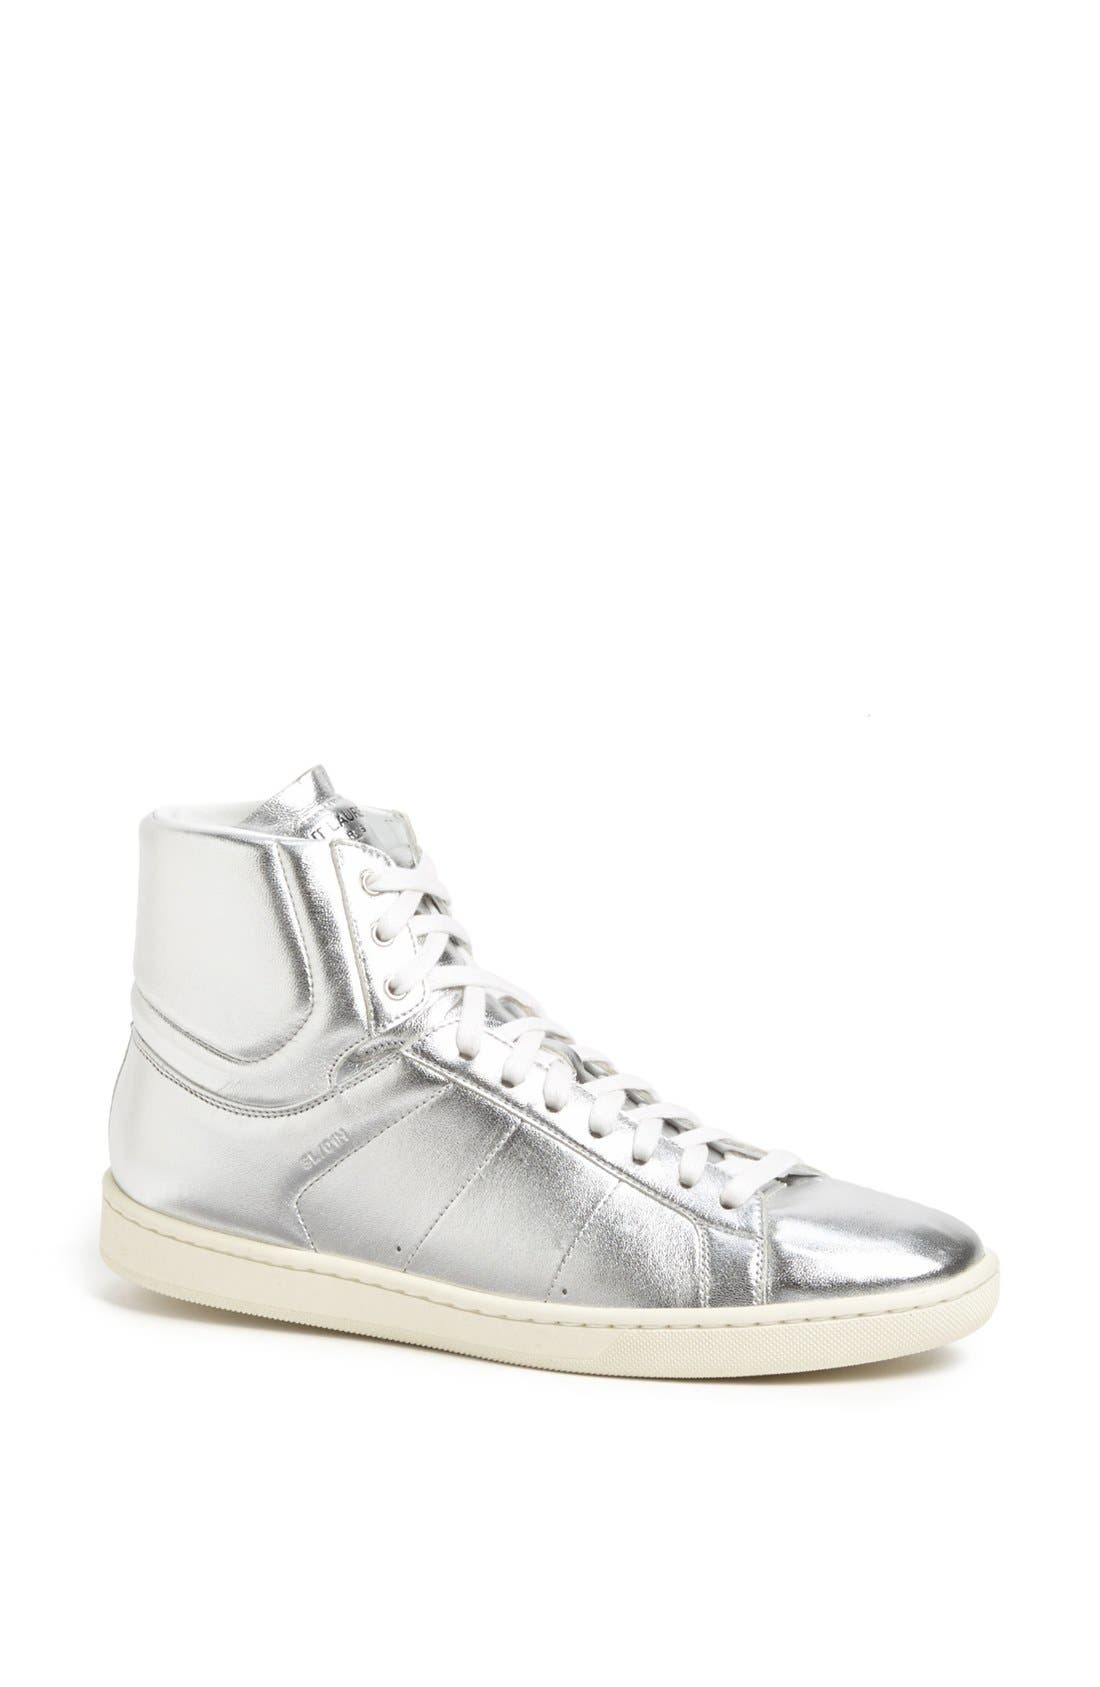 Main Image - Saint Laurent 'Classic Court' Lambskin Leather High Top Sneaker